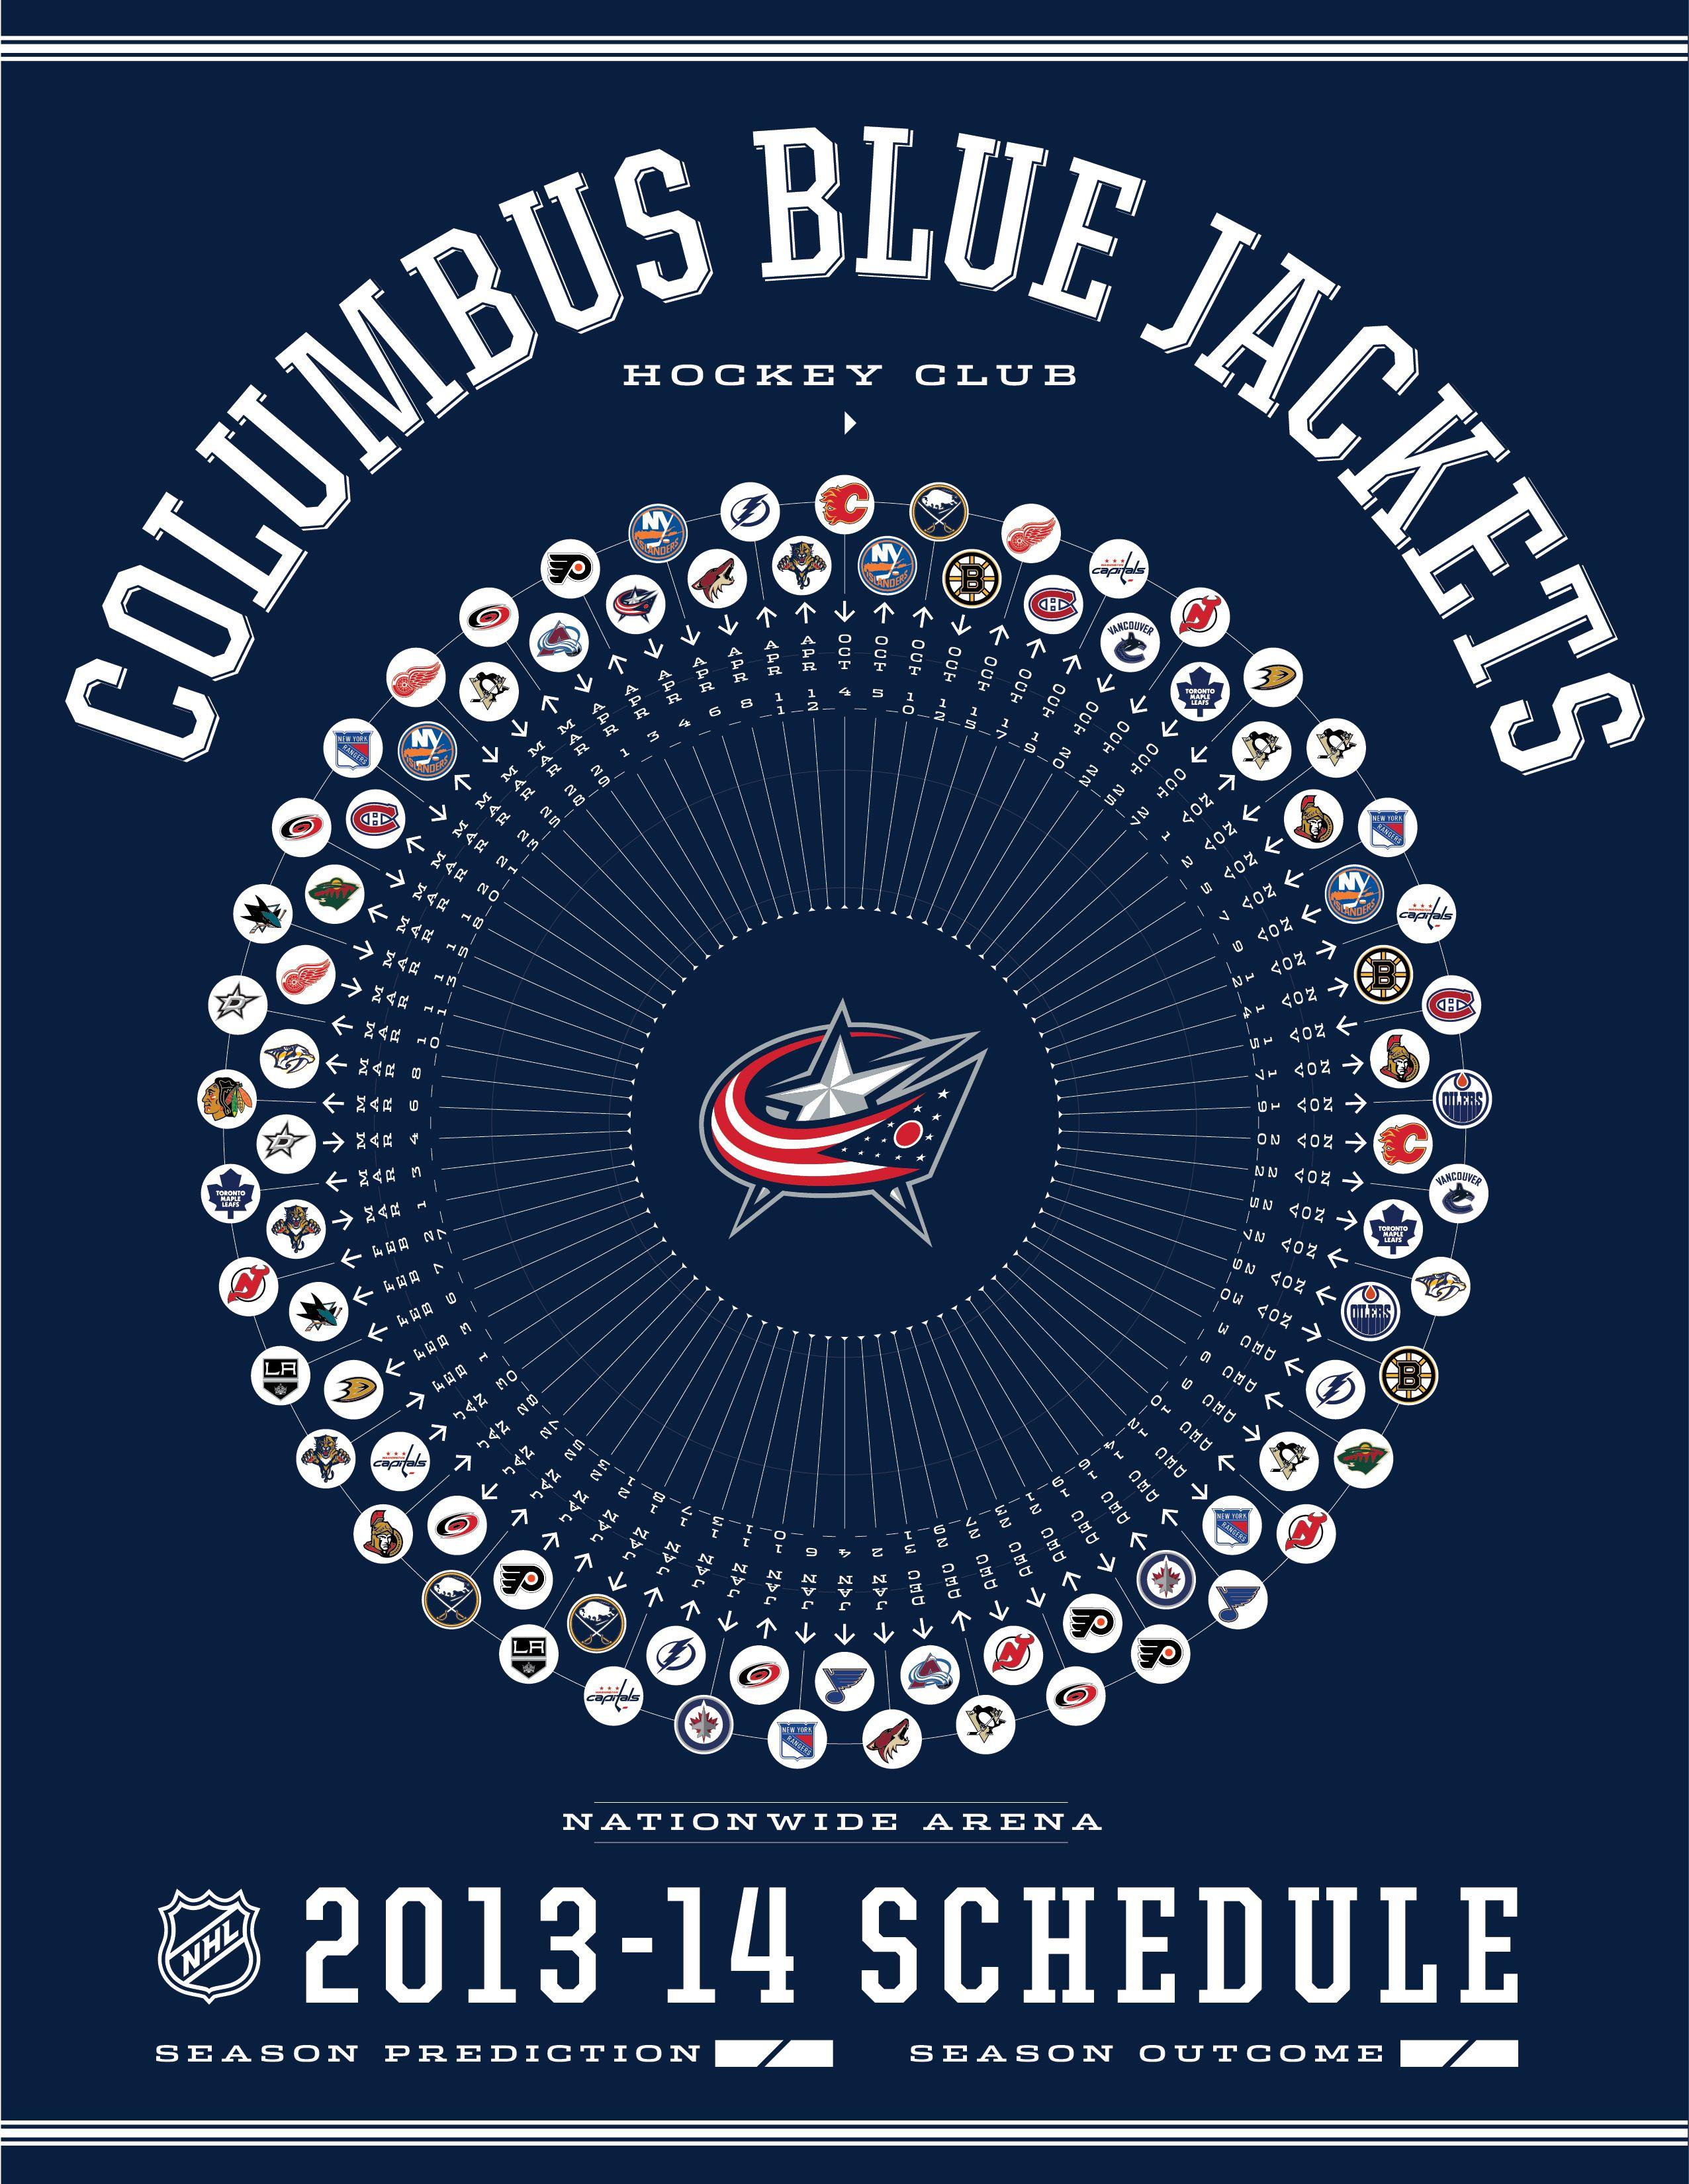 Columbus Blue Jackets 2013-14 Schedule | GO BLUE JACKETS